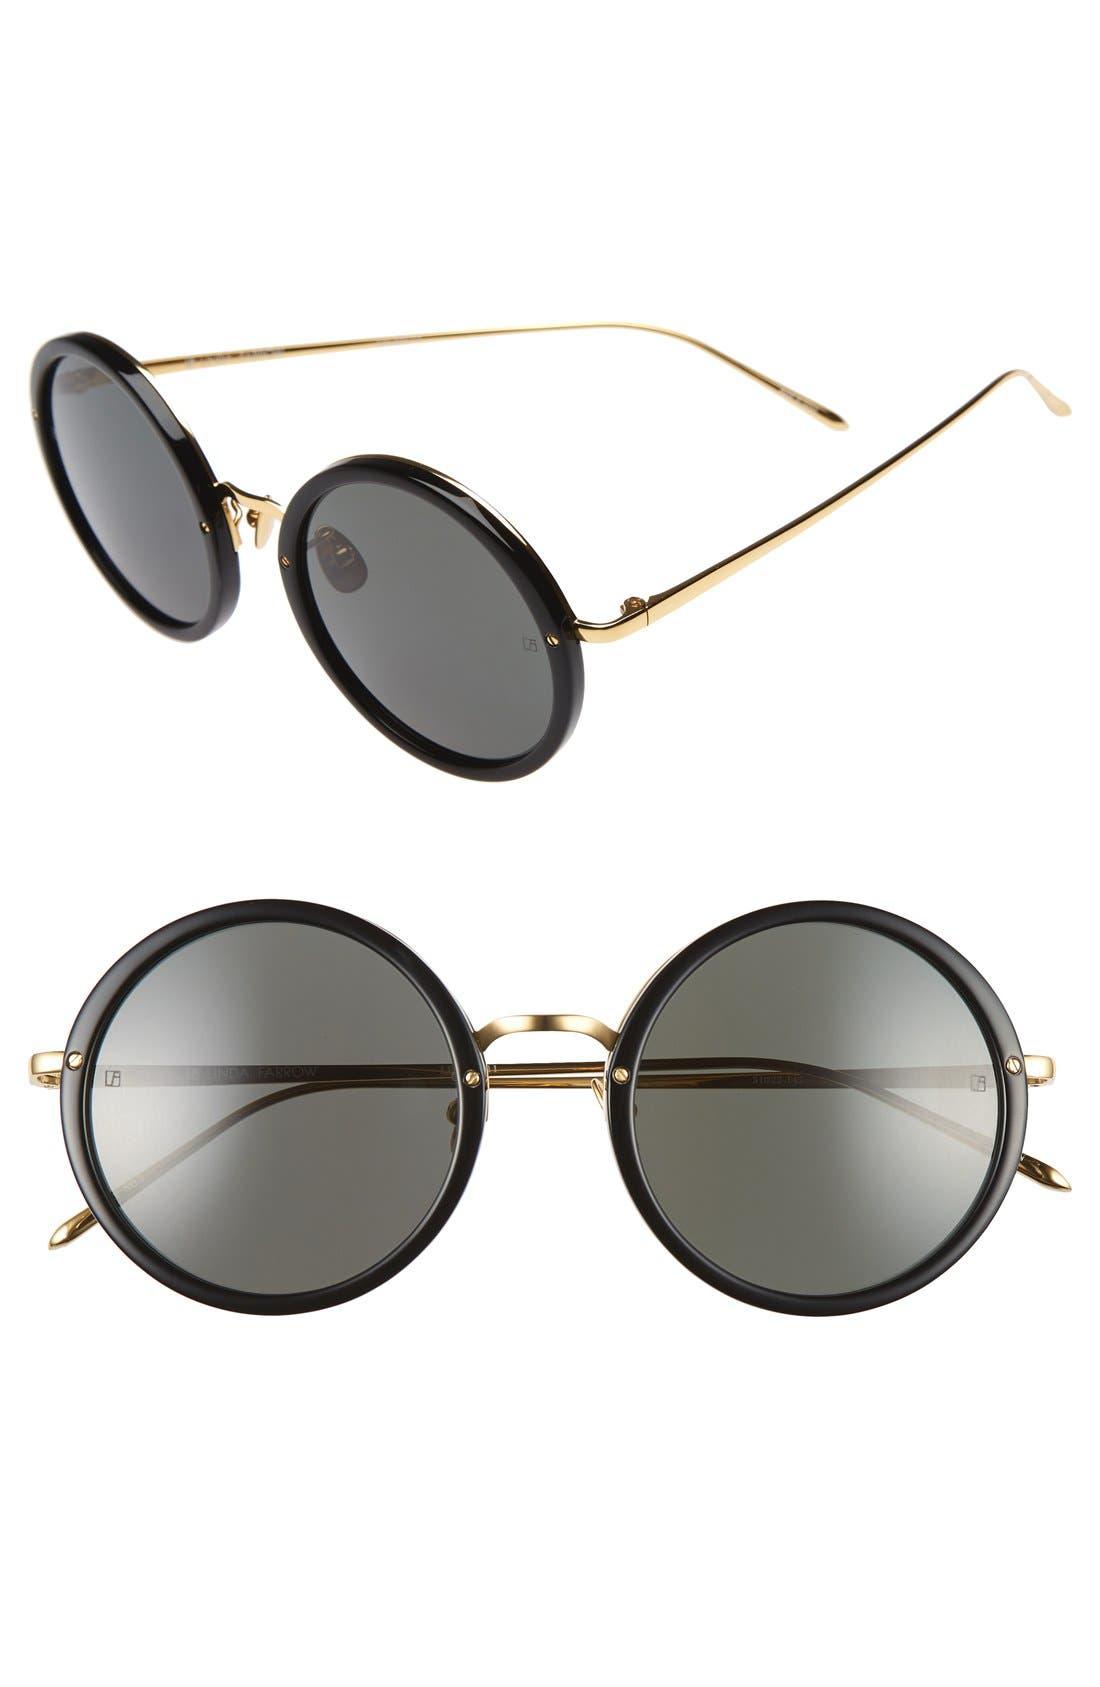 Main Image - Linda Farrow 51mm Round 24 Karat Gold Trim Sunglasses